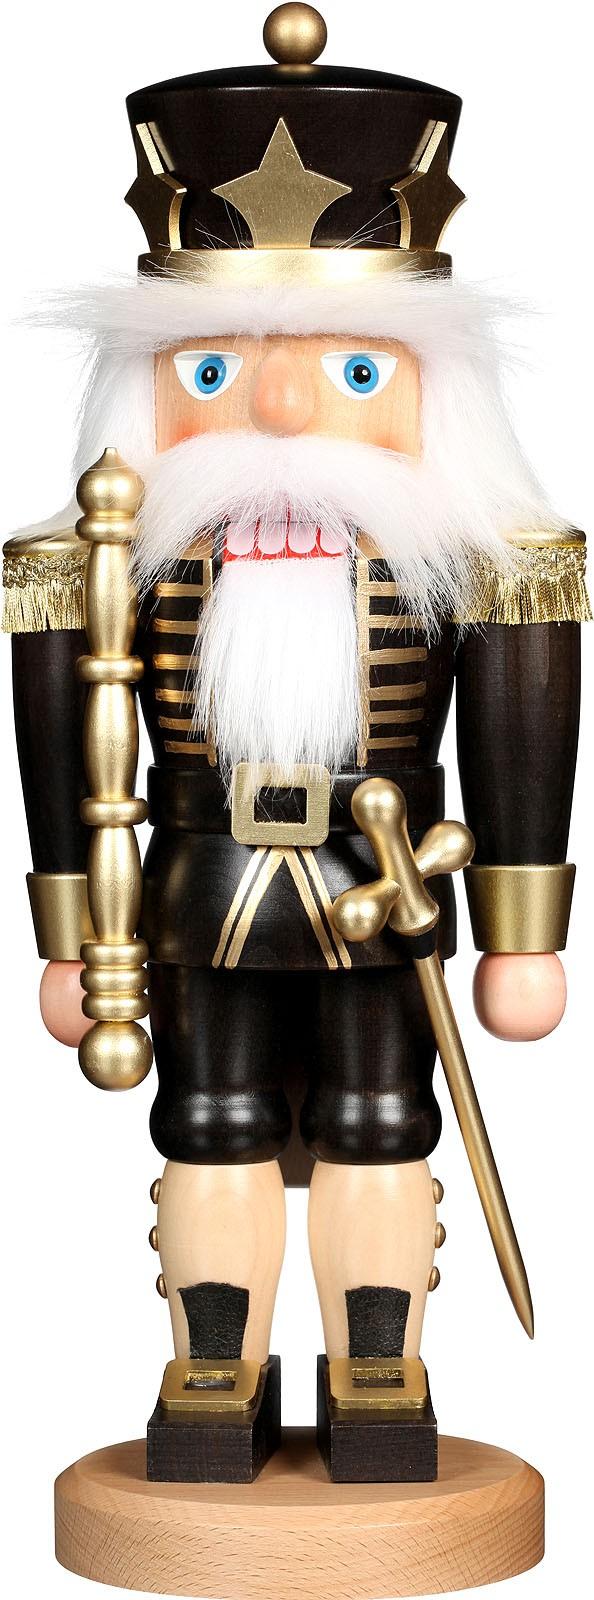 Nussknacker König schwarz